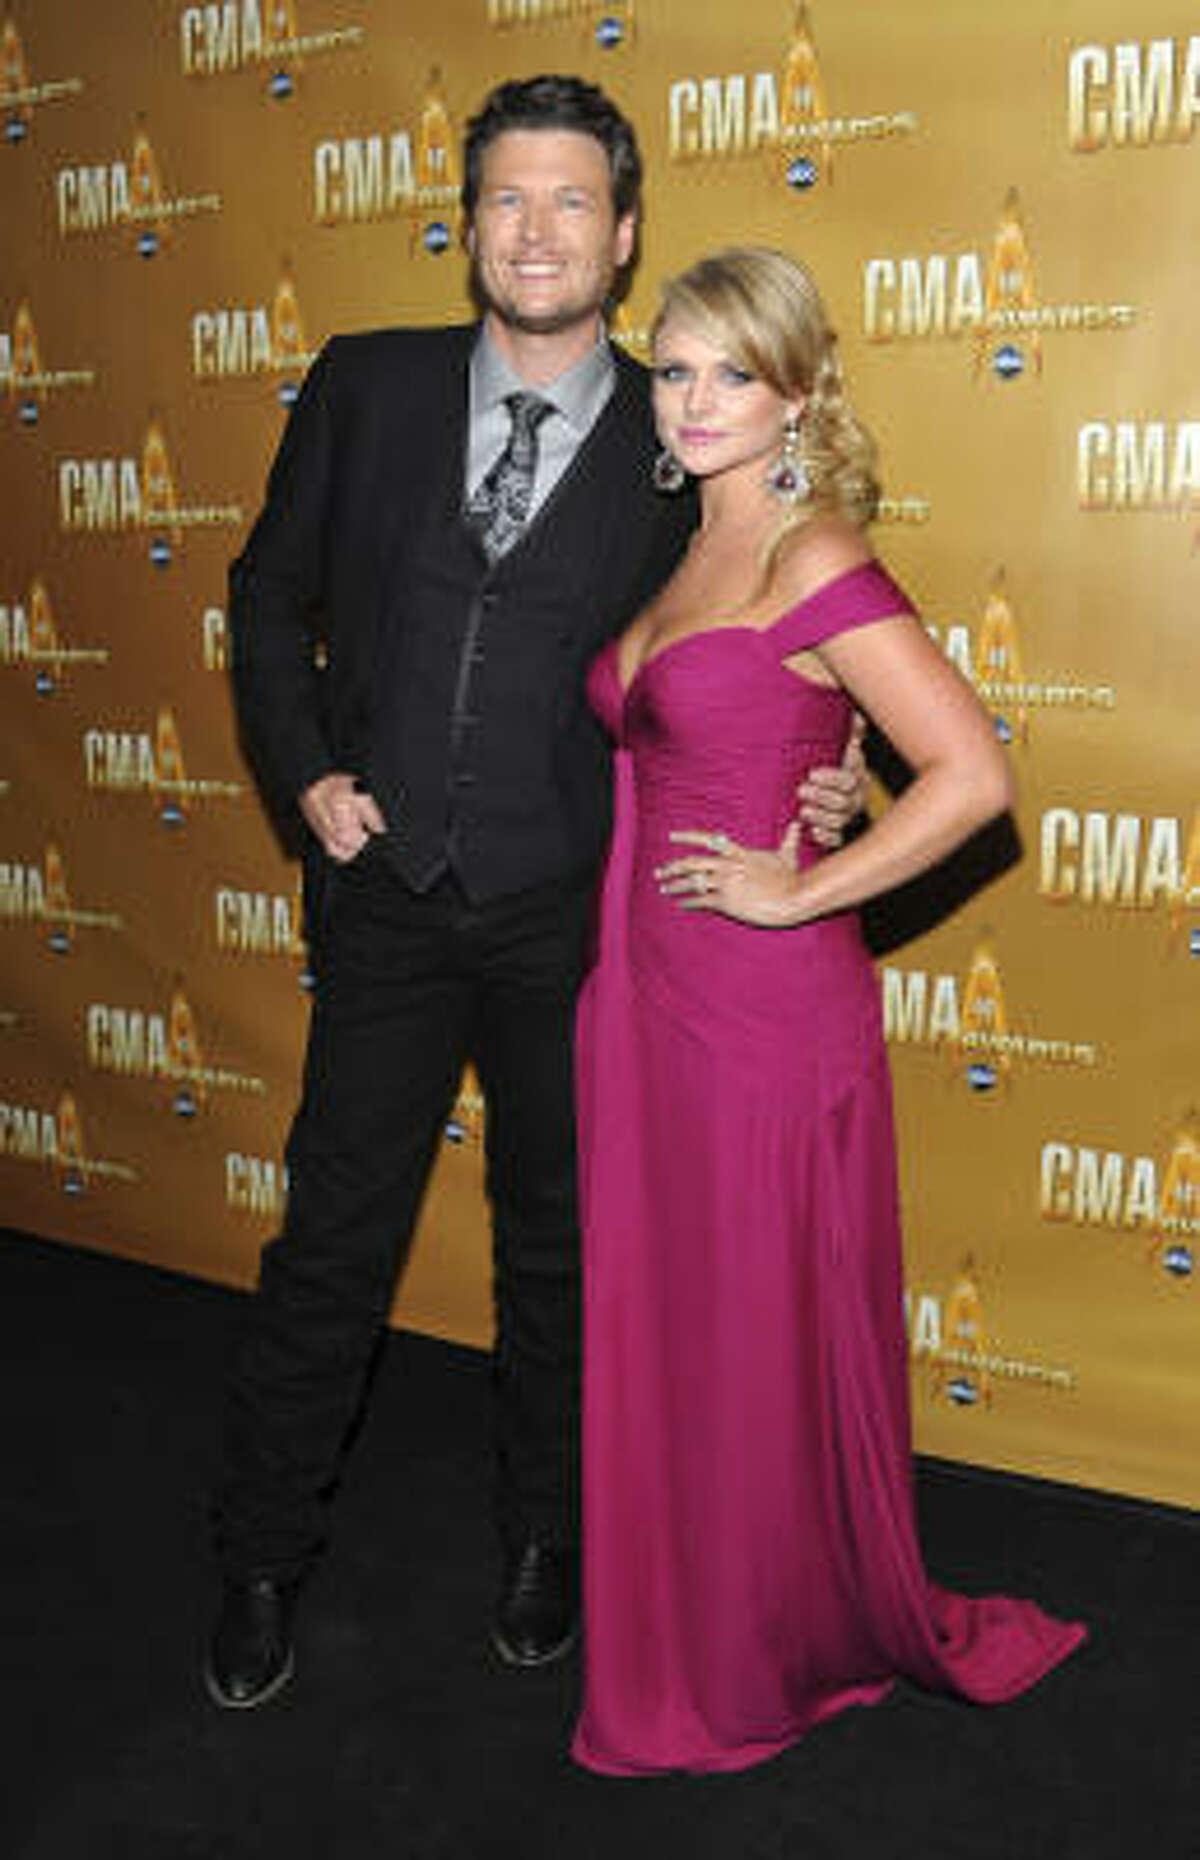 Country couple Miranda Lambert and Blake Shelton